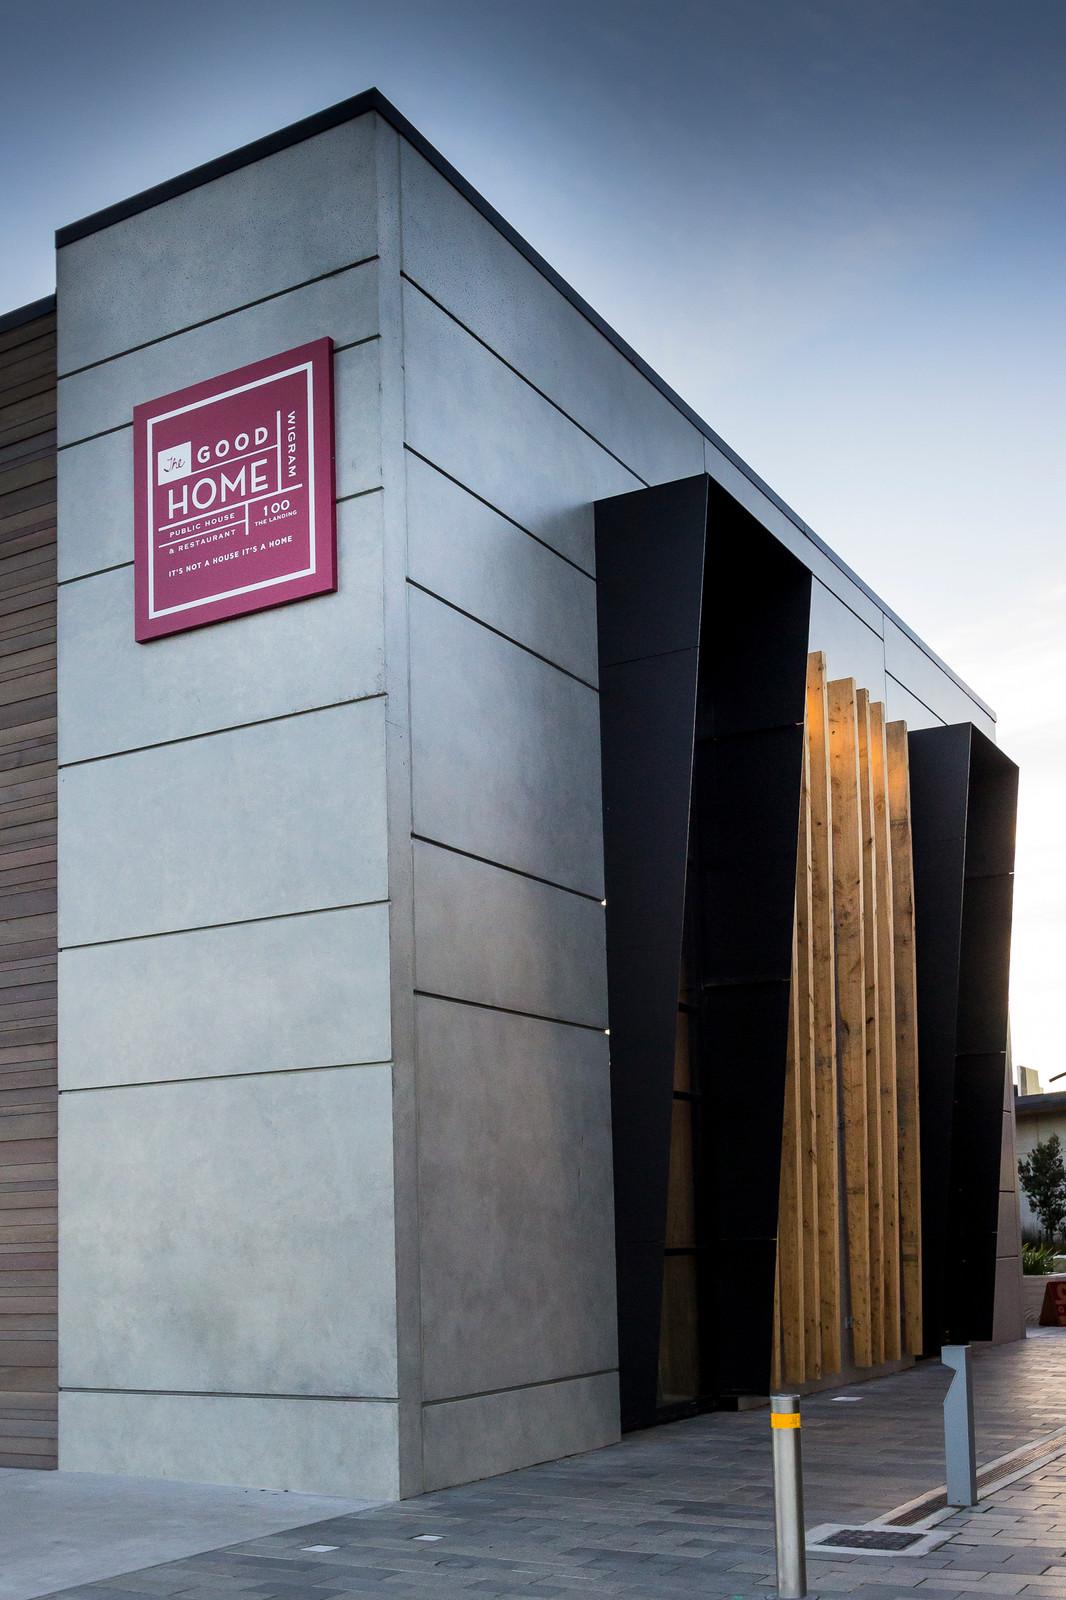 The-good-home-bar | Christchurch | gavingillsonphotography